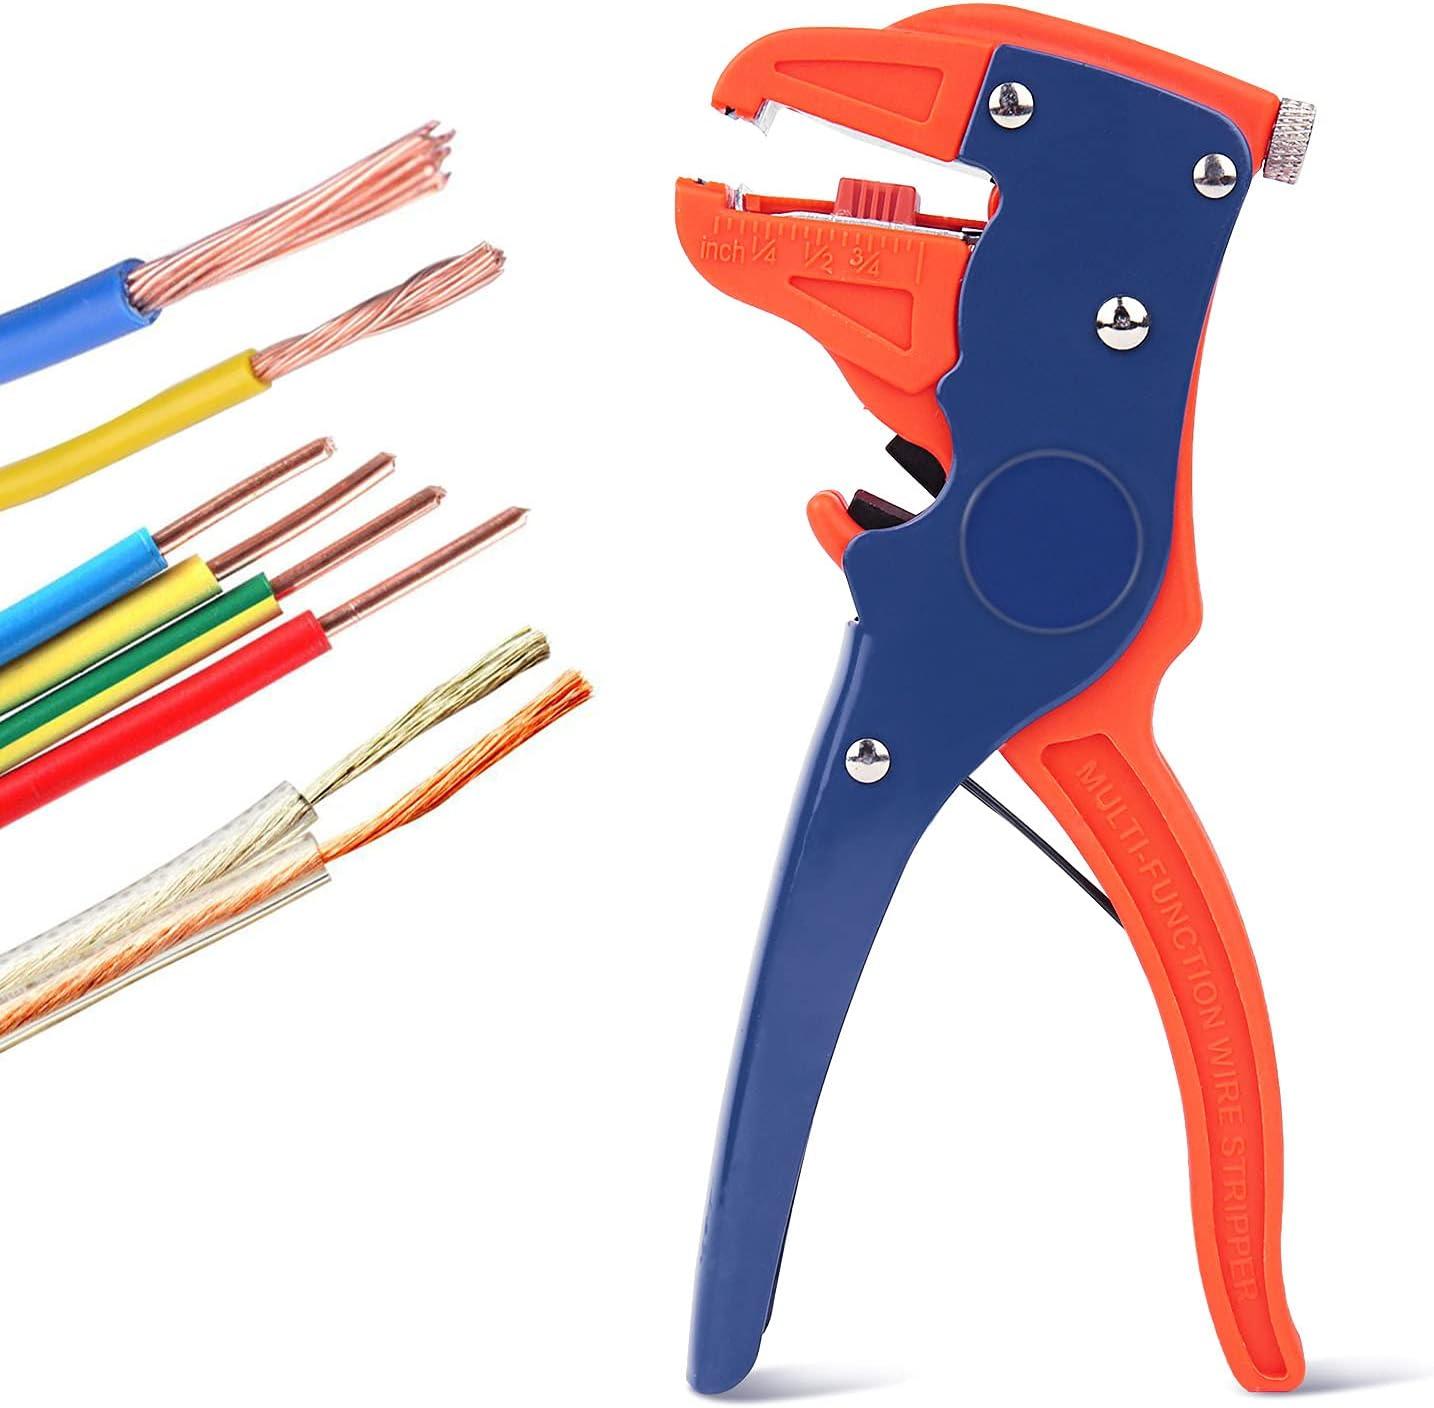 BOENFU Wire Stripper and Cutter Strip Self Adjusting Tool Quick Ranking TOP7 SALENEW very popular